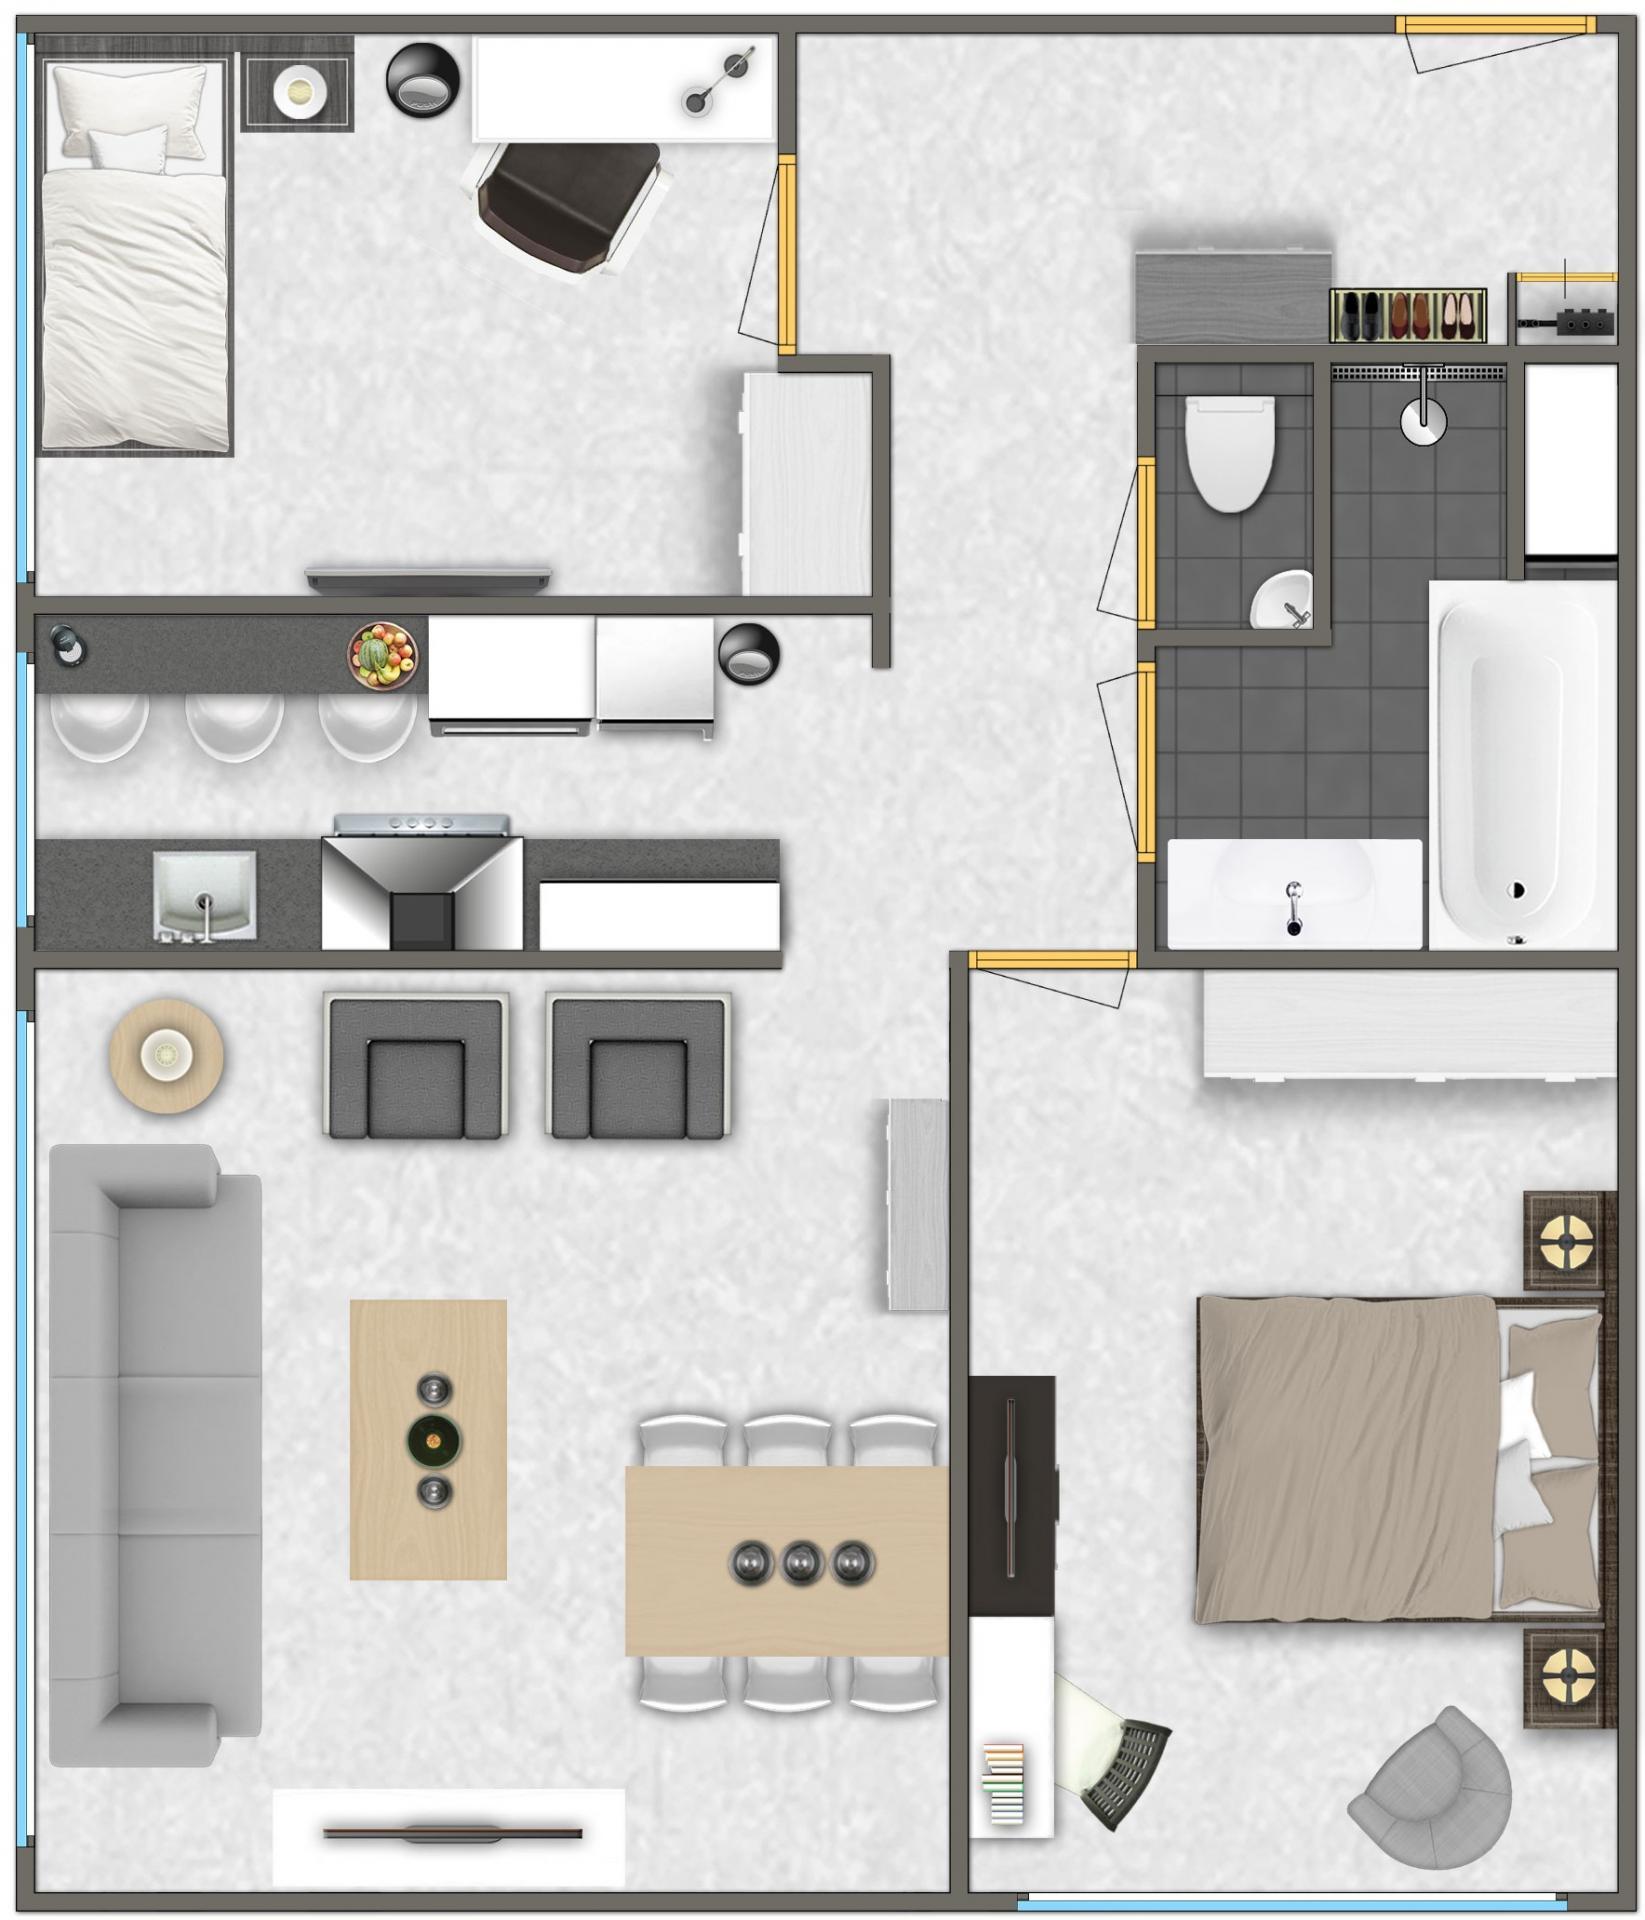 2 bed floor plan at Htel Amsterdam Buitenveldert